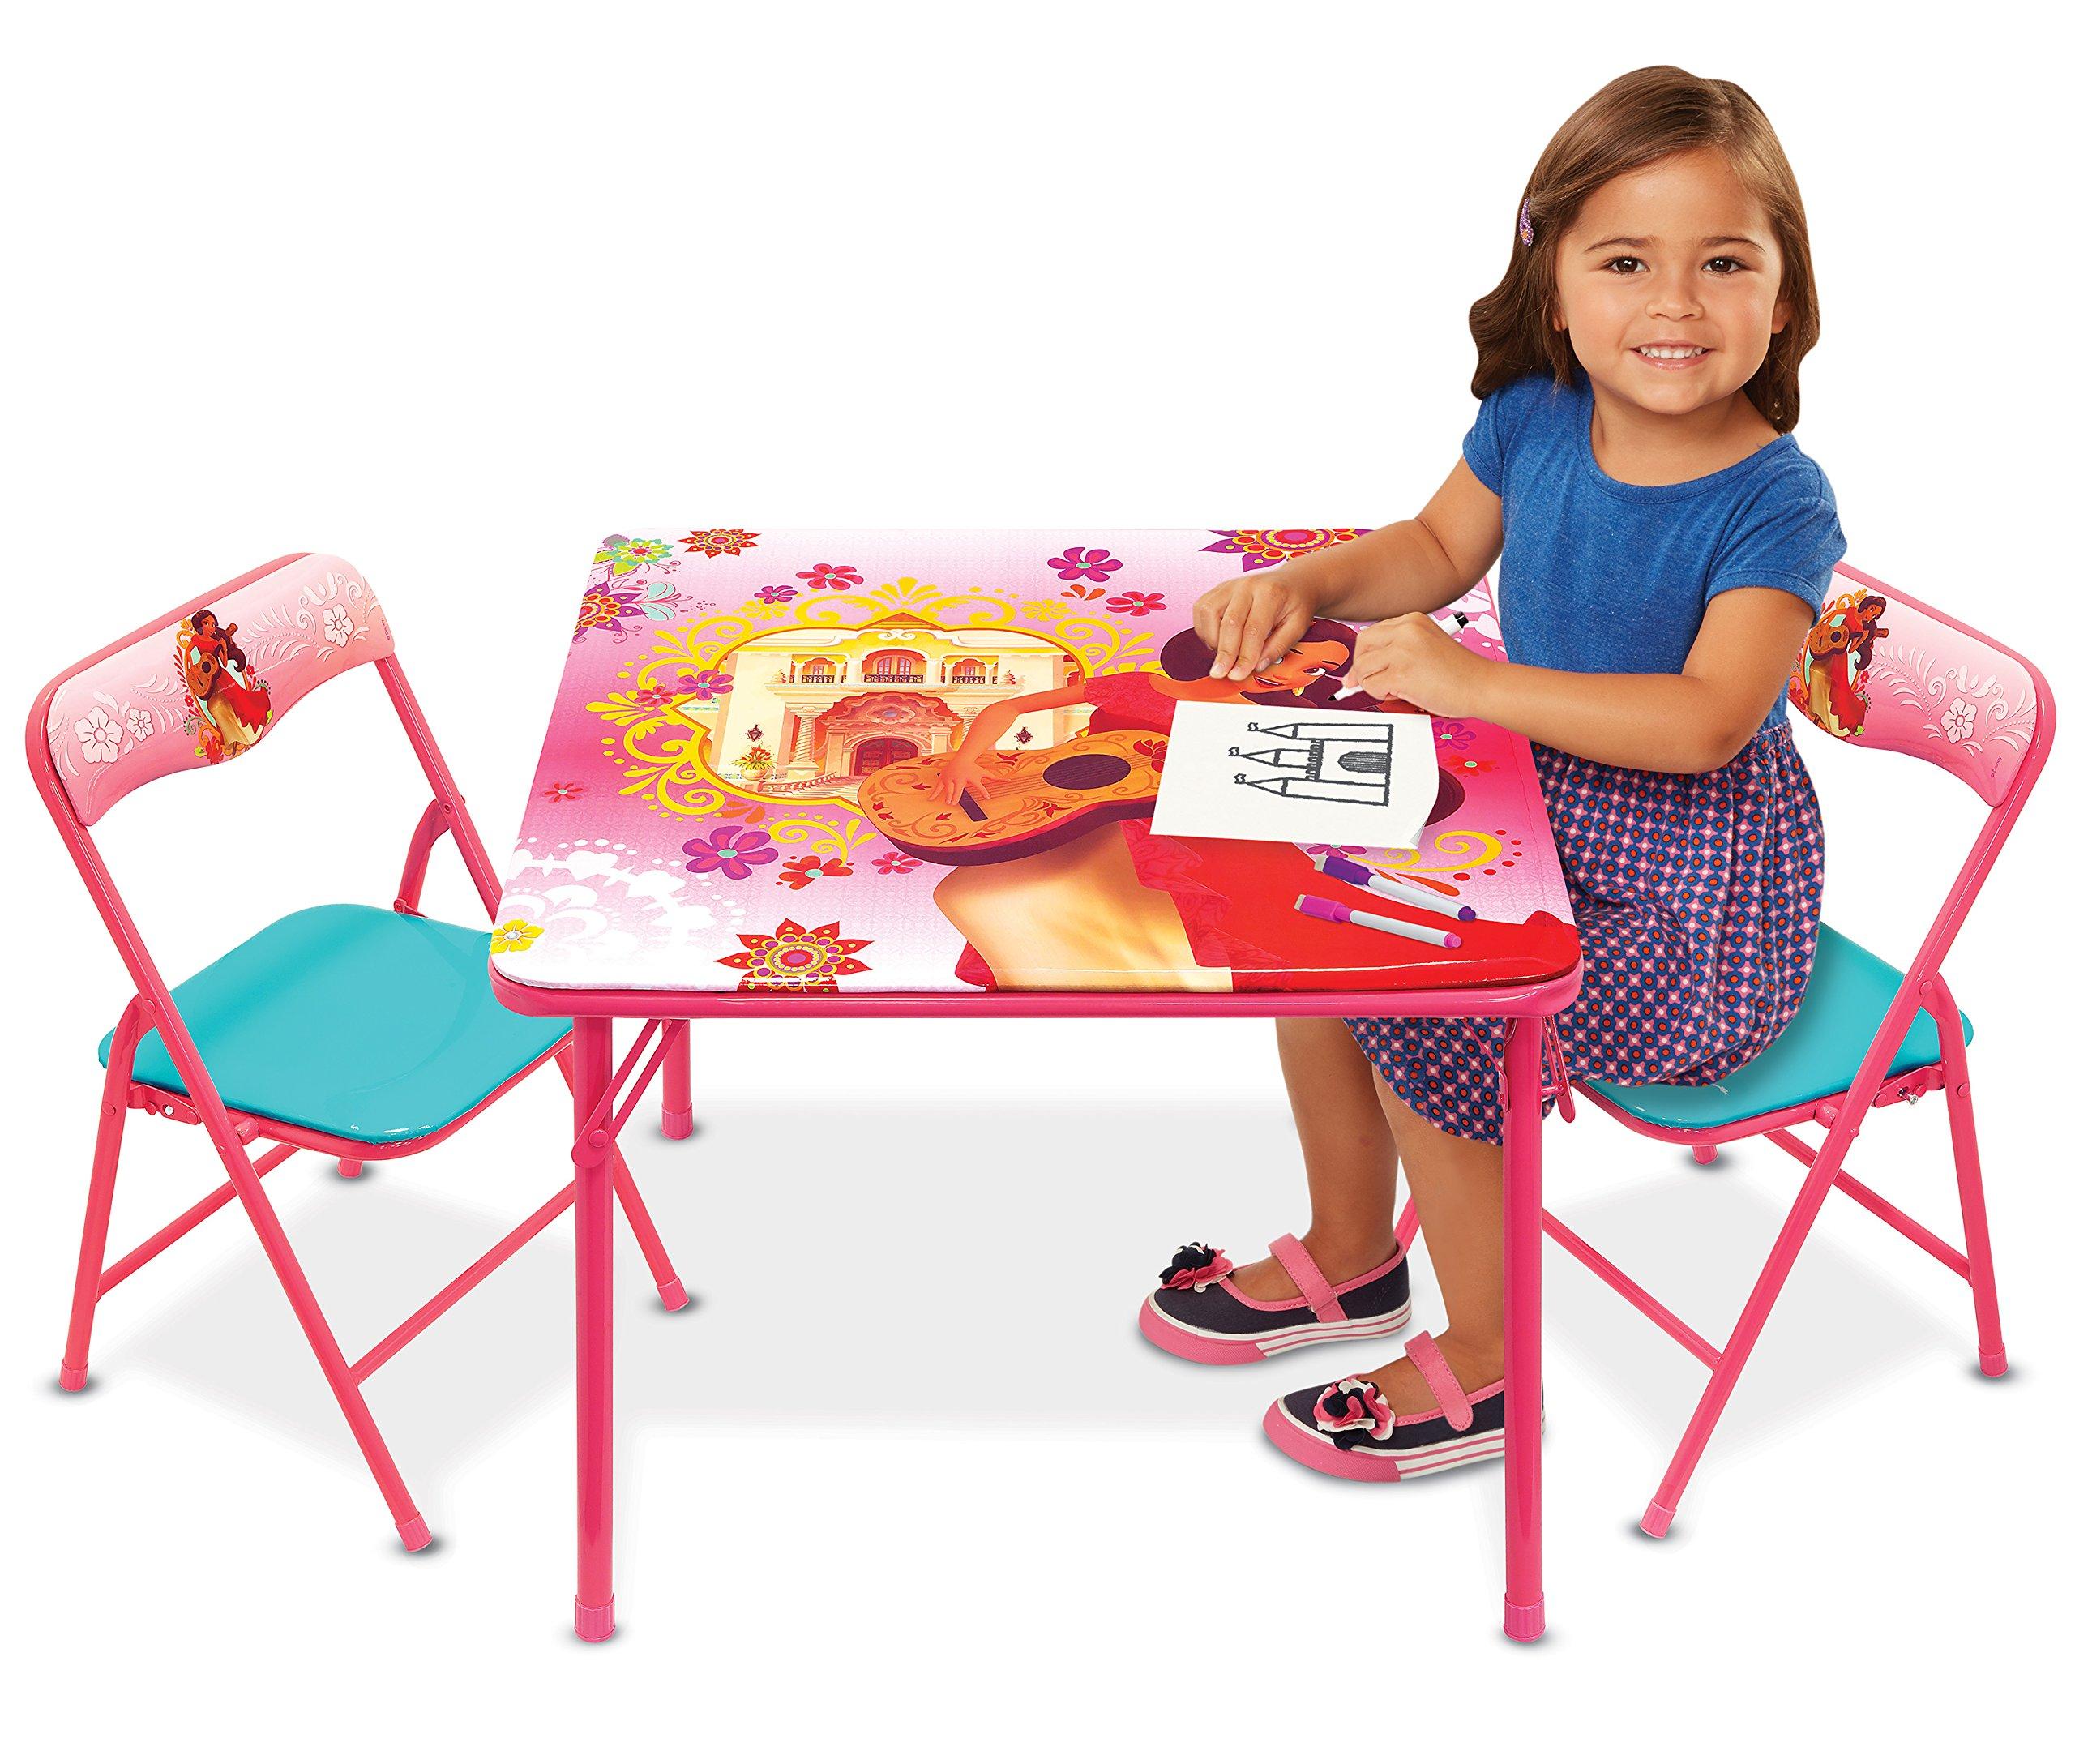 Elena of Avalor Activity Table Playset